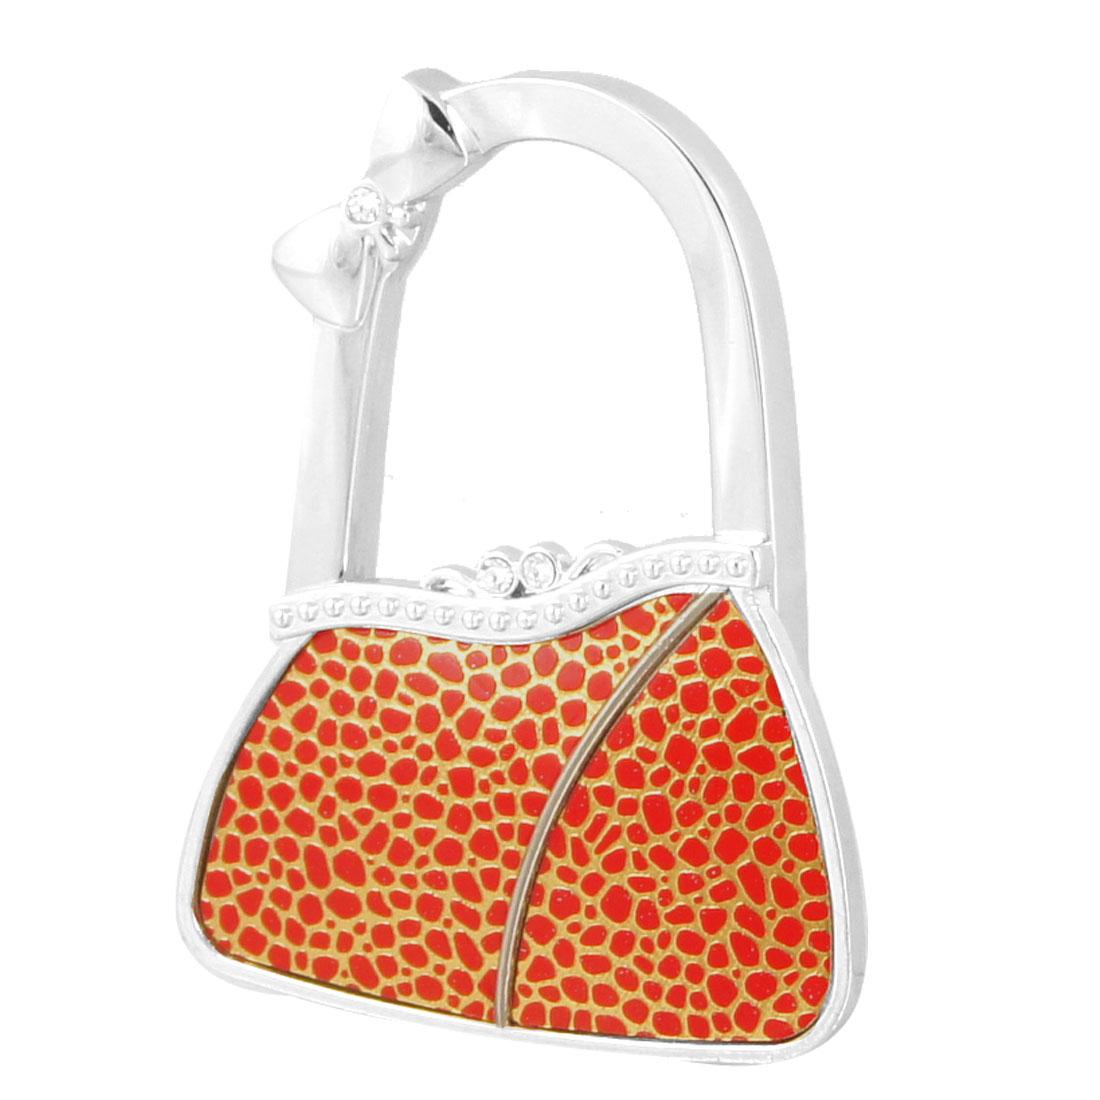 Gold Tone Red Cobble Pattern Metal Bag Shaped Foldable Handbag Hook